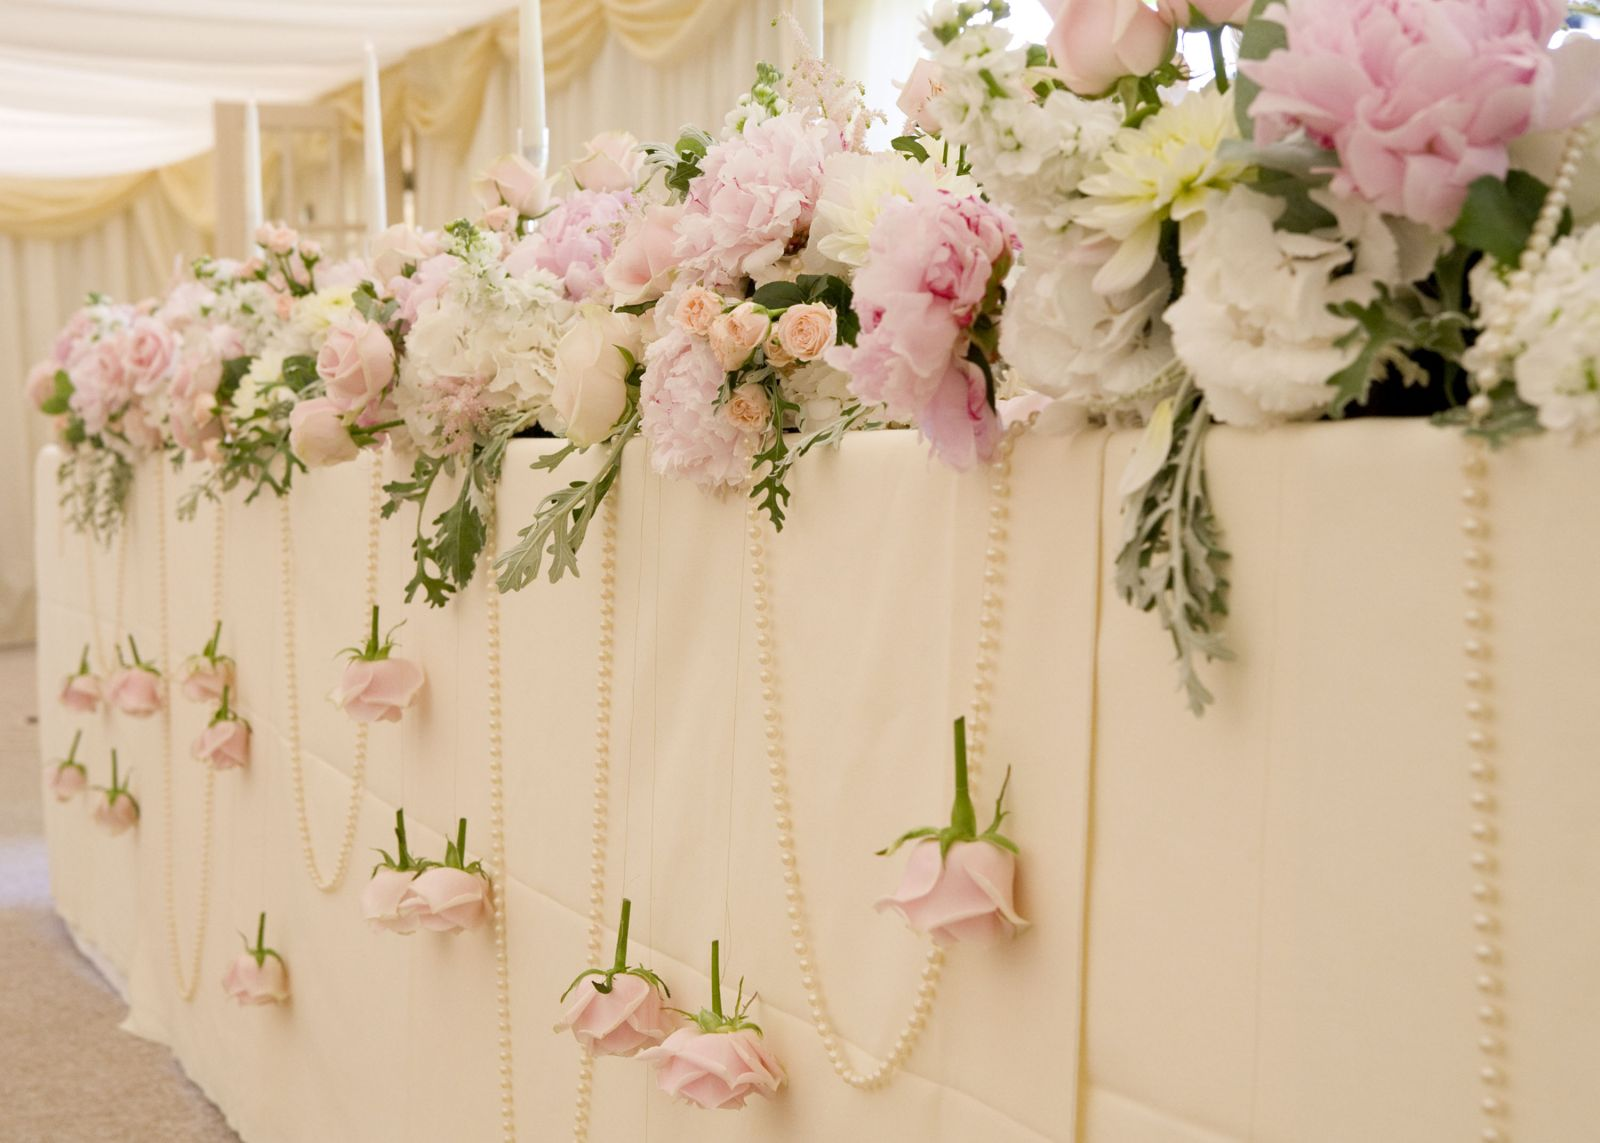 top wedding flowers photo - 1